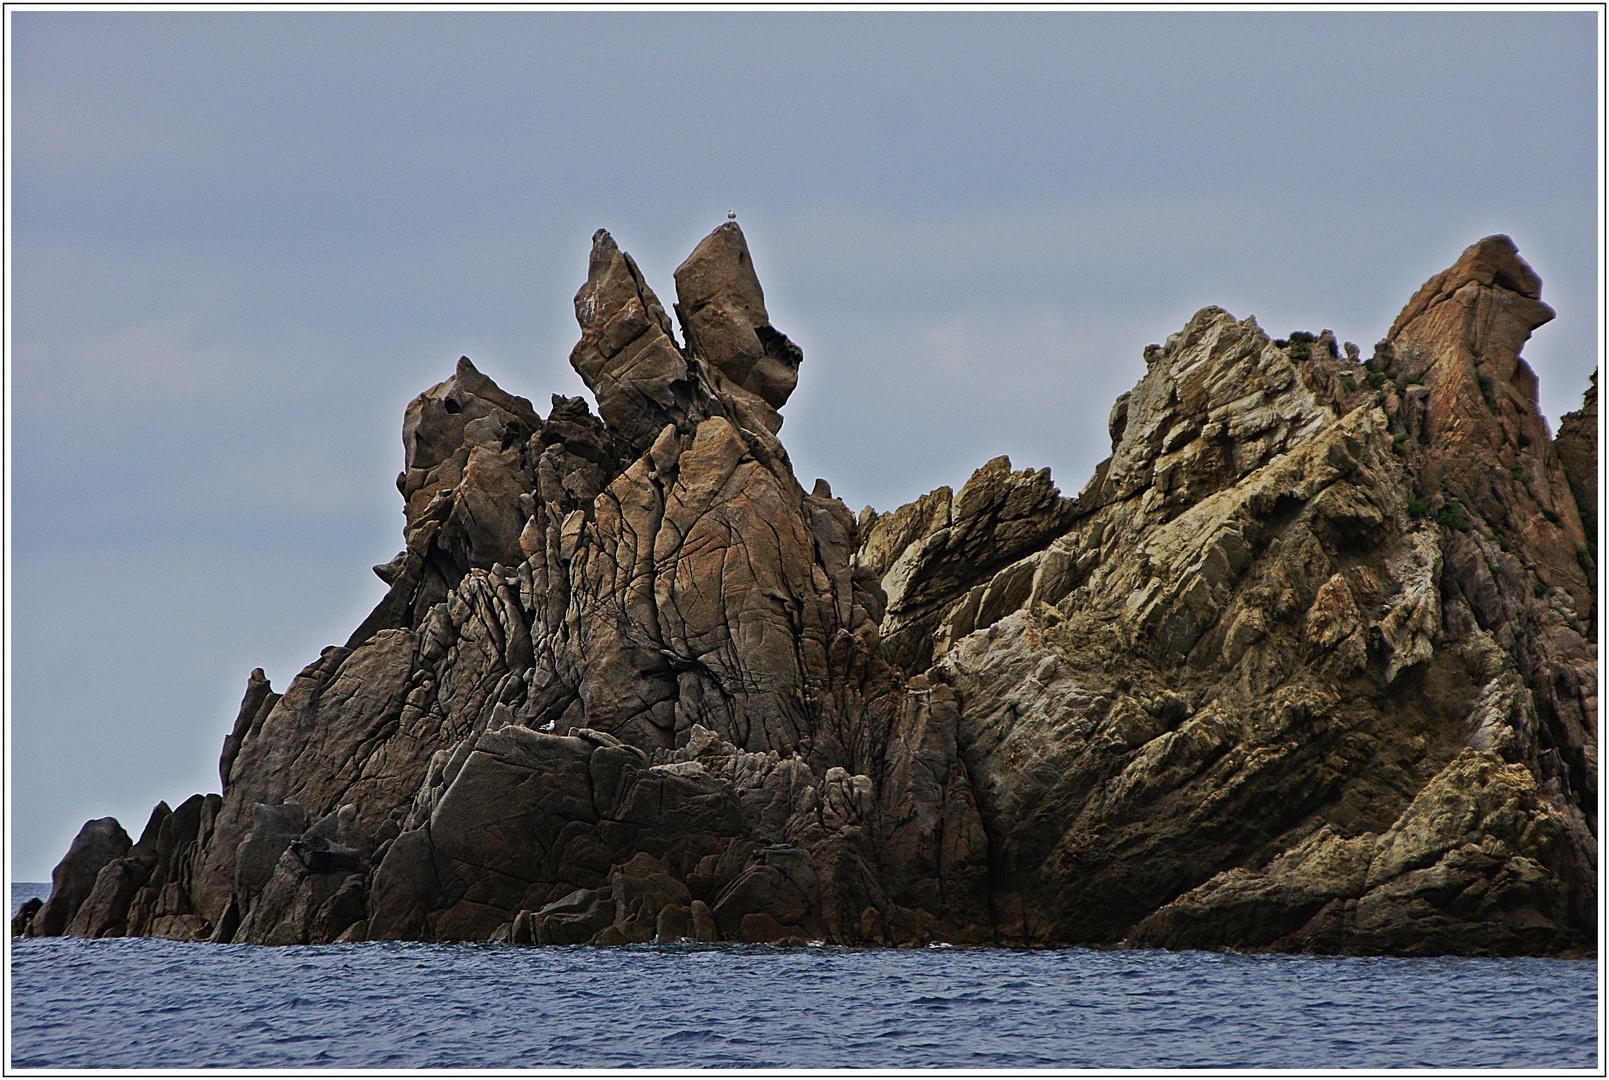 Costa Rei; Punta de ls Cappuccinos